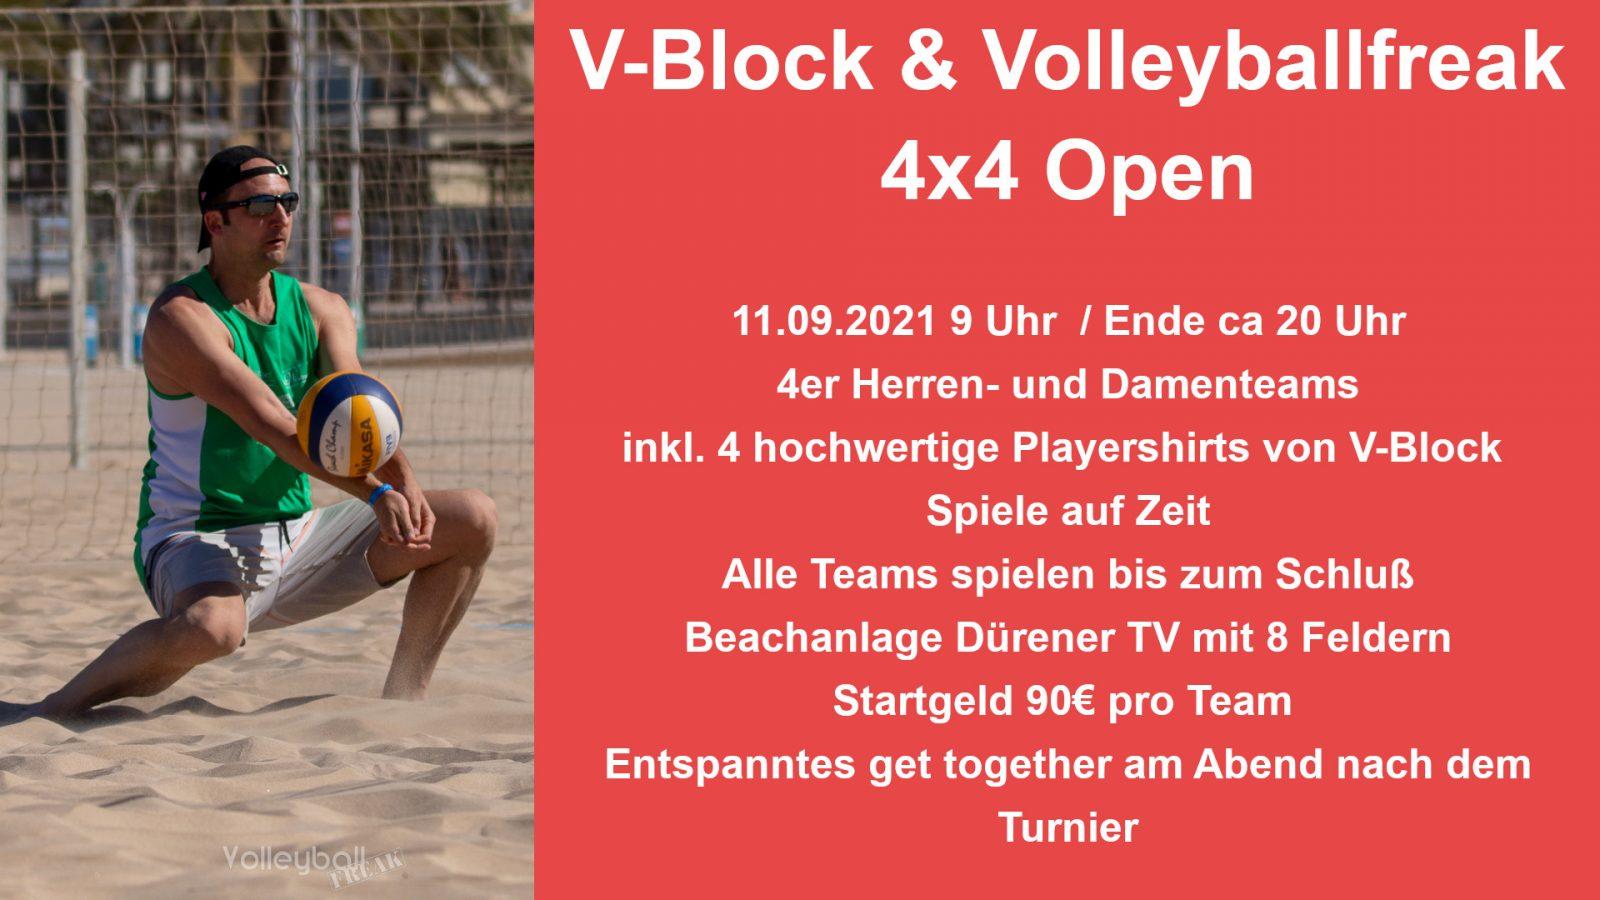 V-Block & Volleyballfreak 4×4 Open